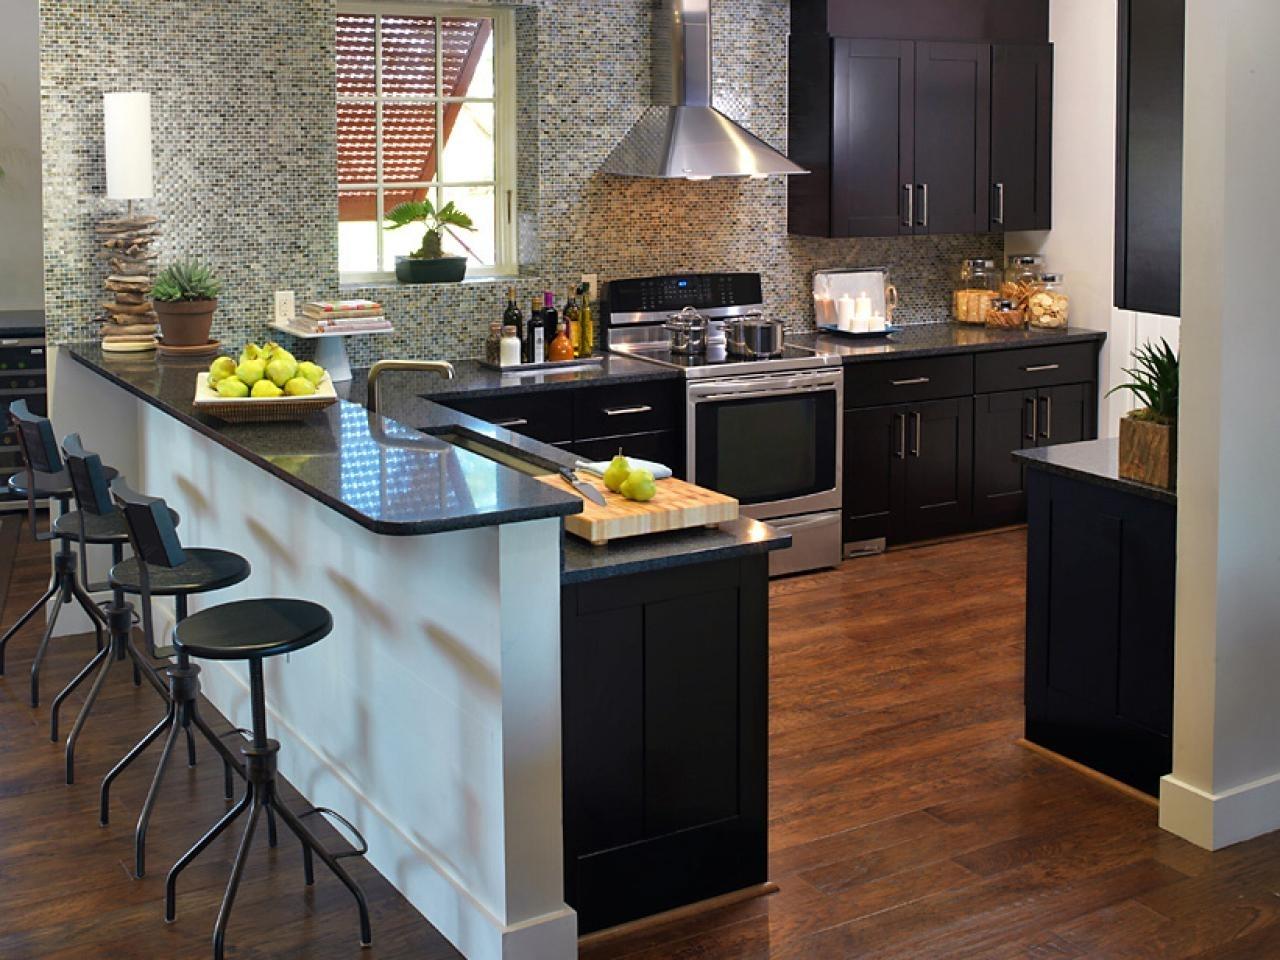 Black Granite Kitchen Countertops With White Cabinets ...